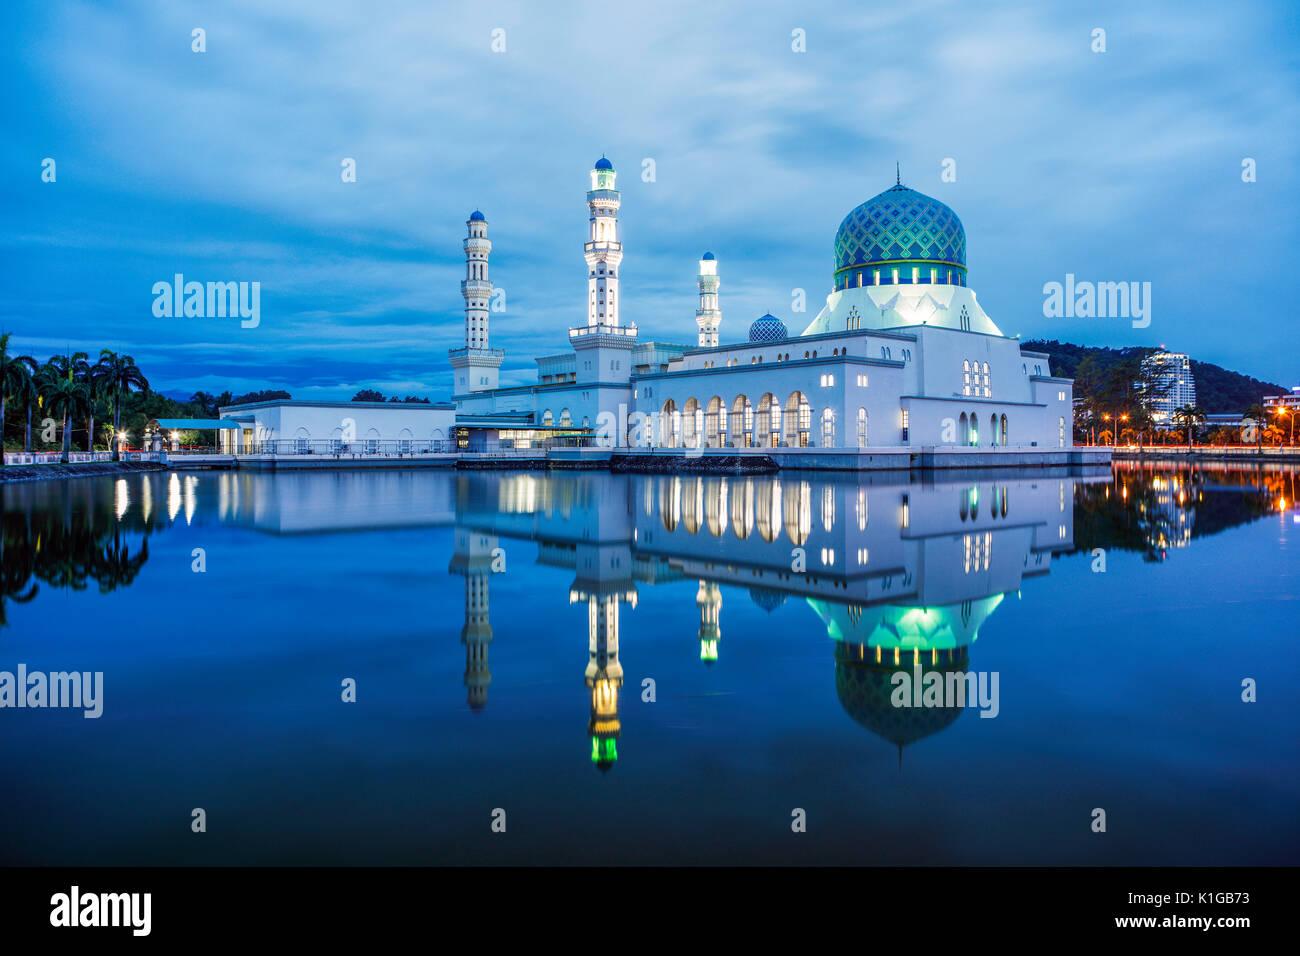 The Kota Kinabalu State Mosque during twilight. - Stock Image